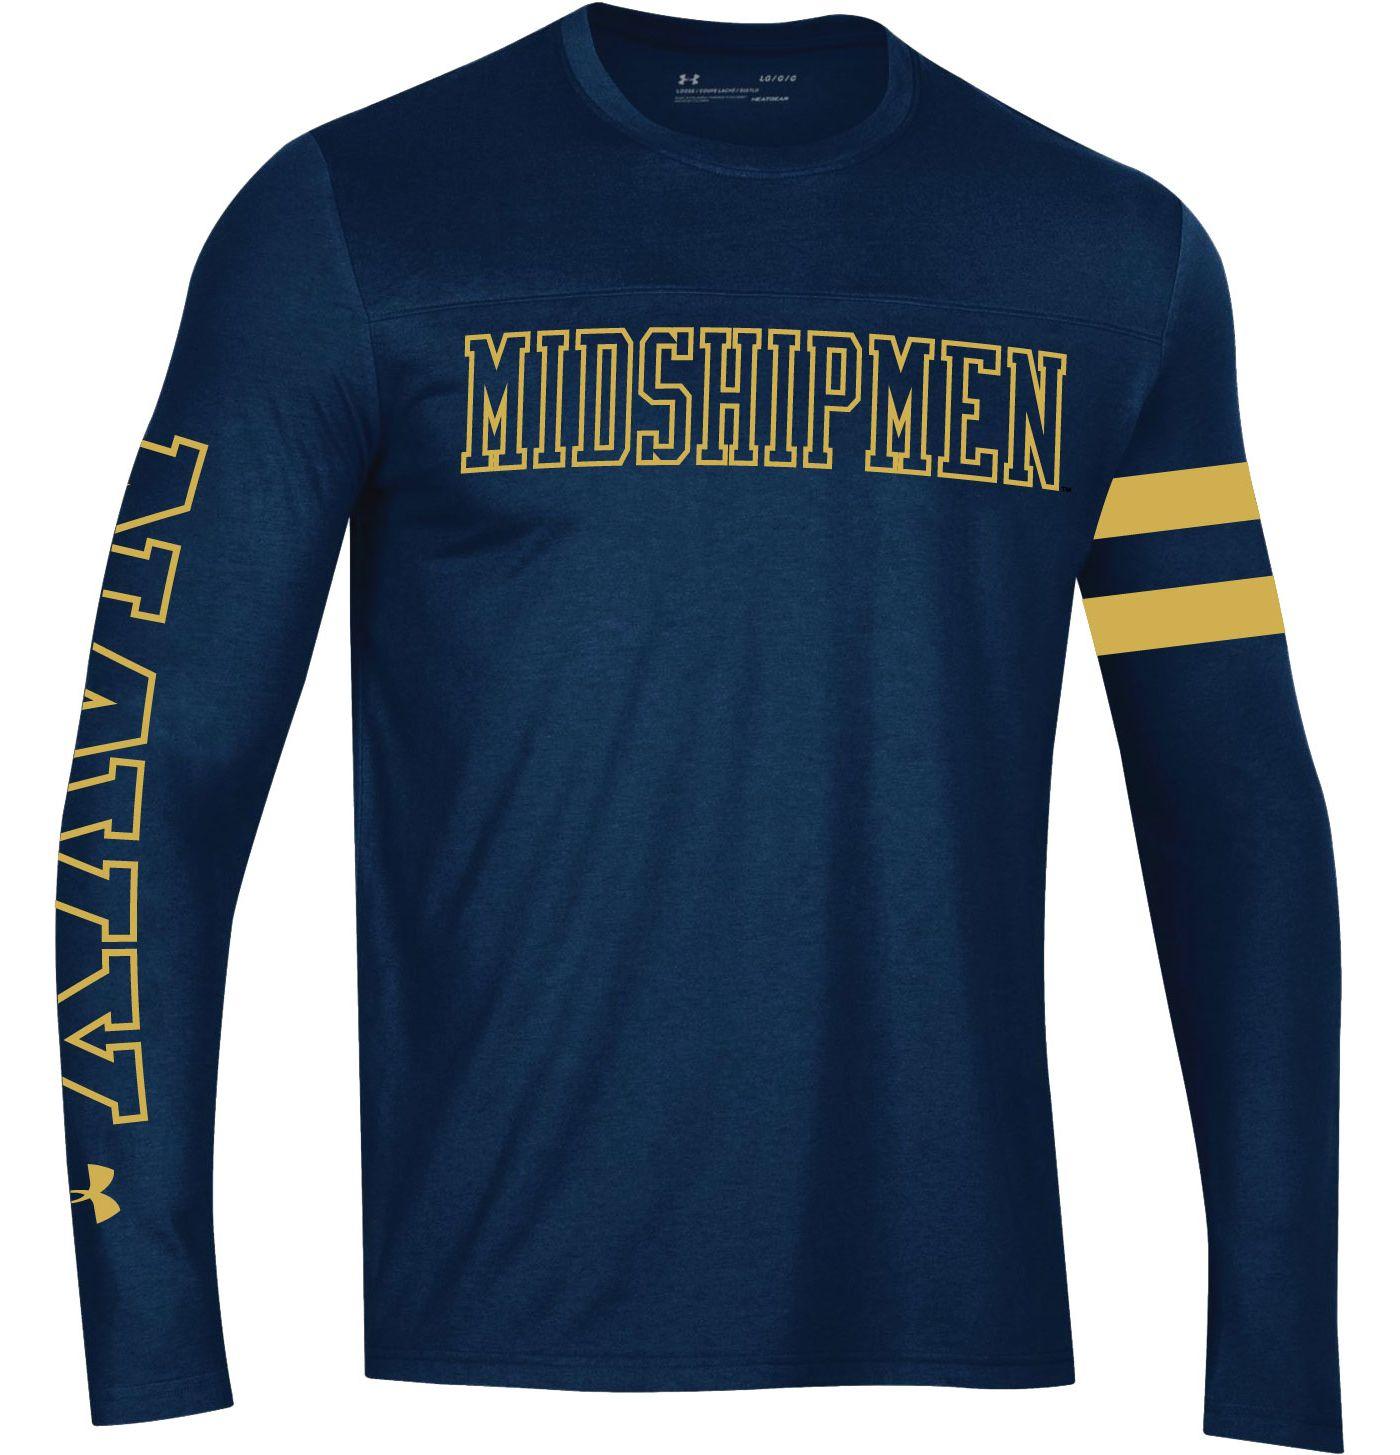 Under Armour Men's Navy Midshipmen Navy Performance Cotton Long Sleeve T-Shirt